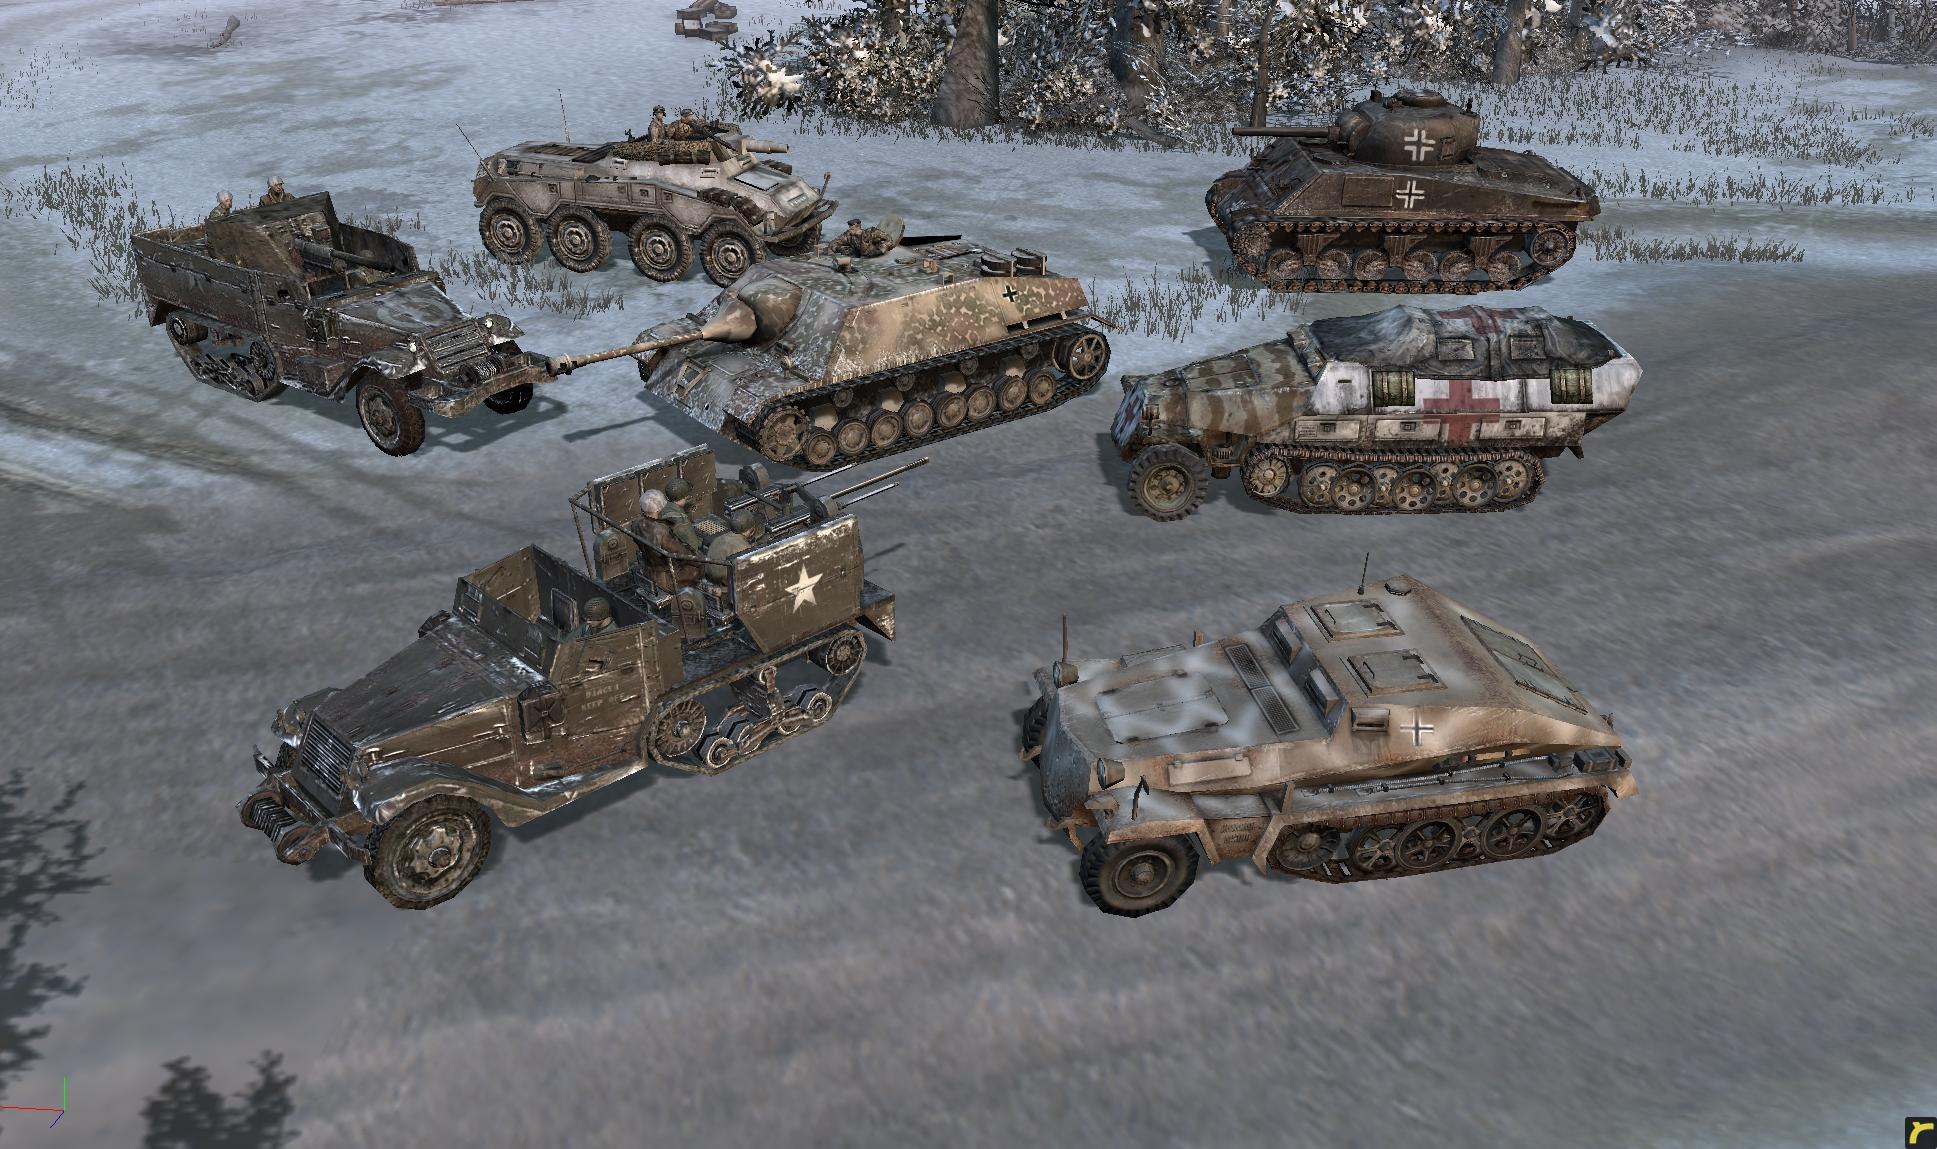 Wacht Am Rhein/Battle of The Bulge - Matrix Games